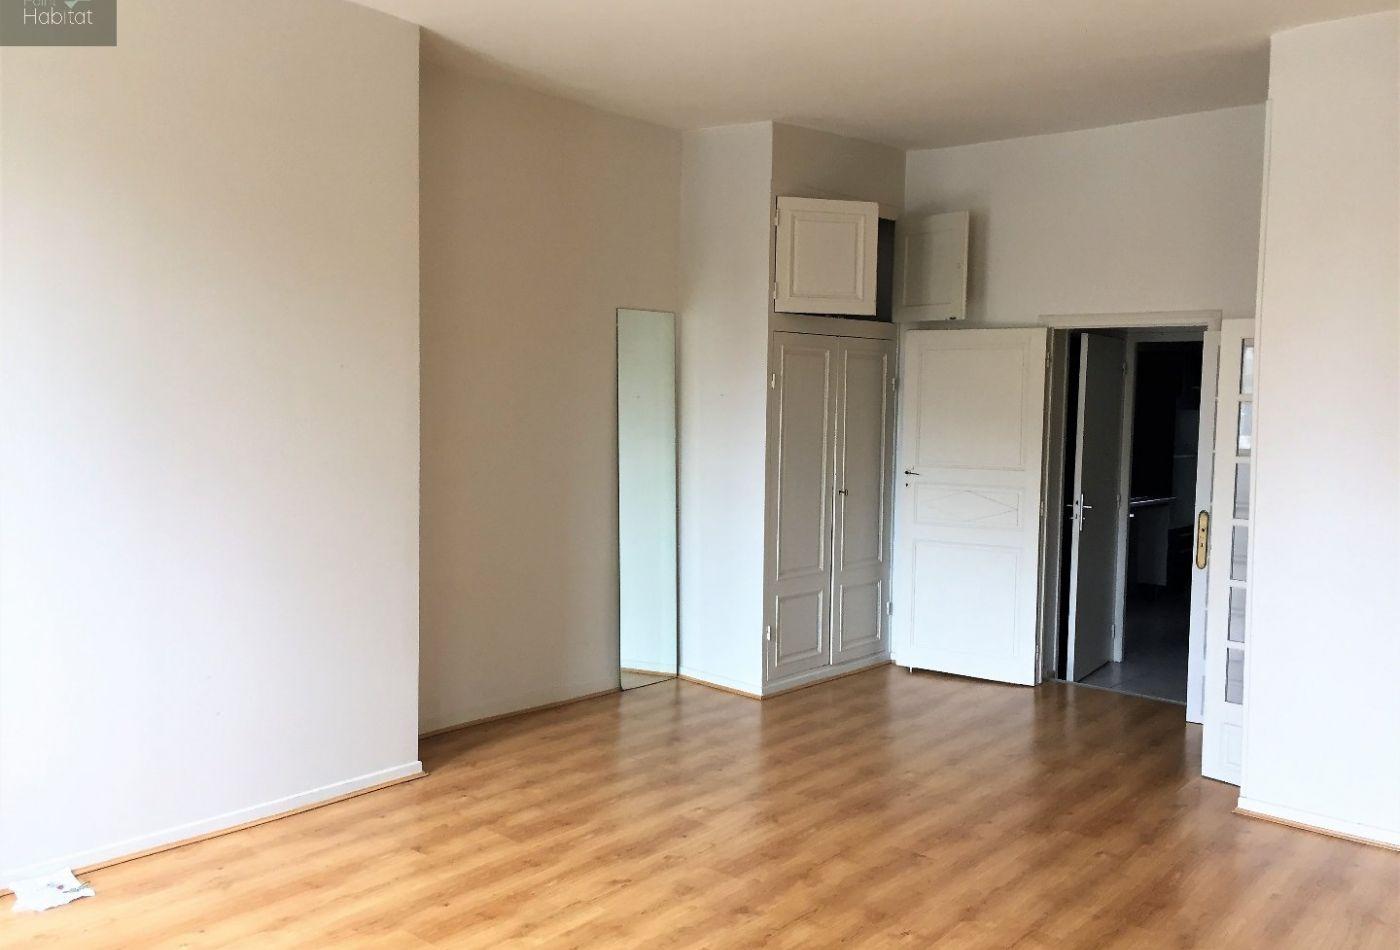 vente appartement rodez 85m 3 pi ces 169 000. Black Bedroom Furniture Sets. Home Design Ideas